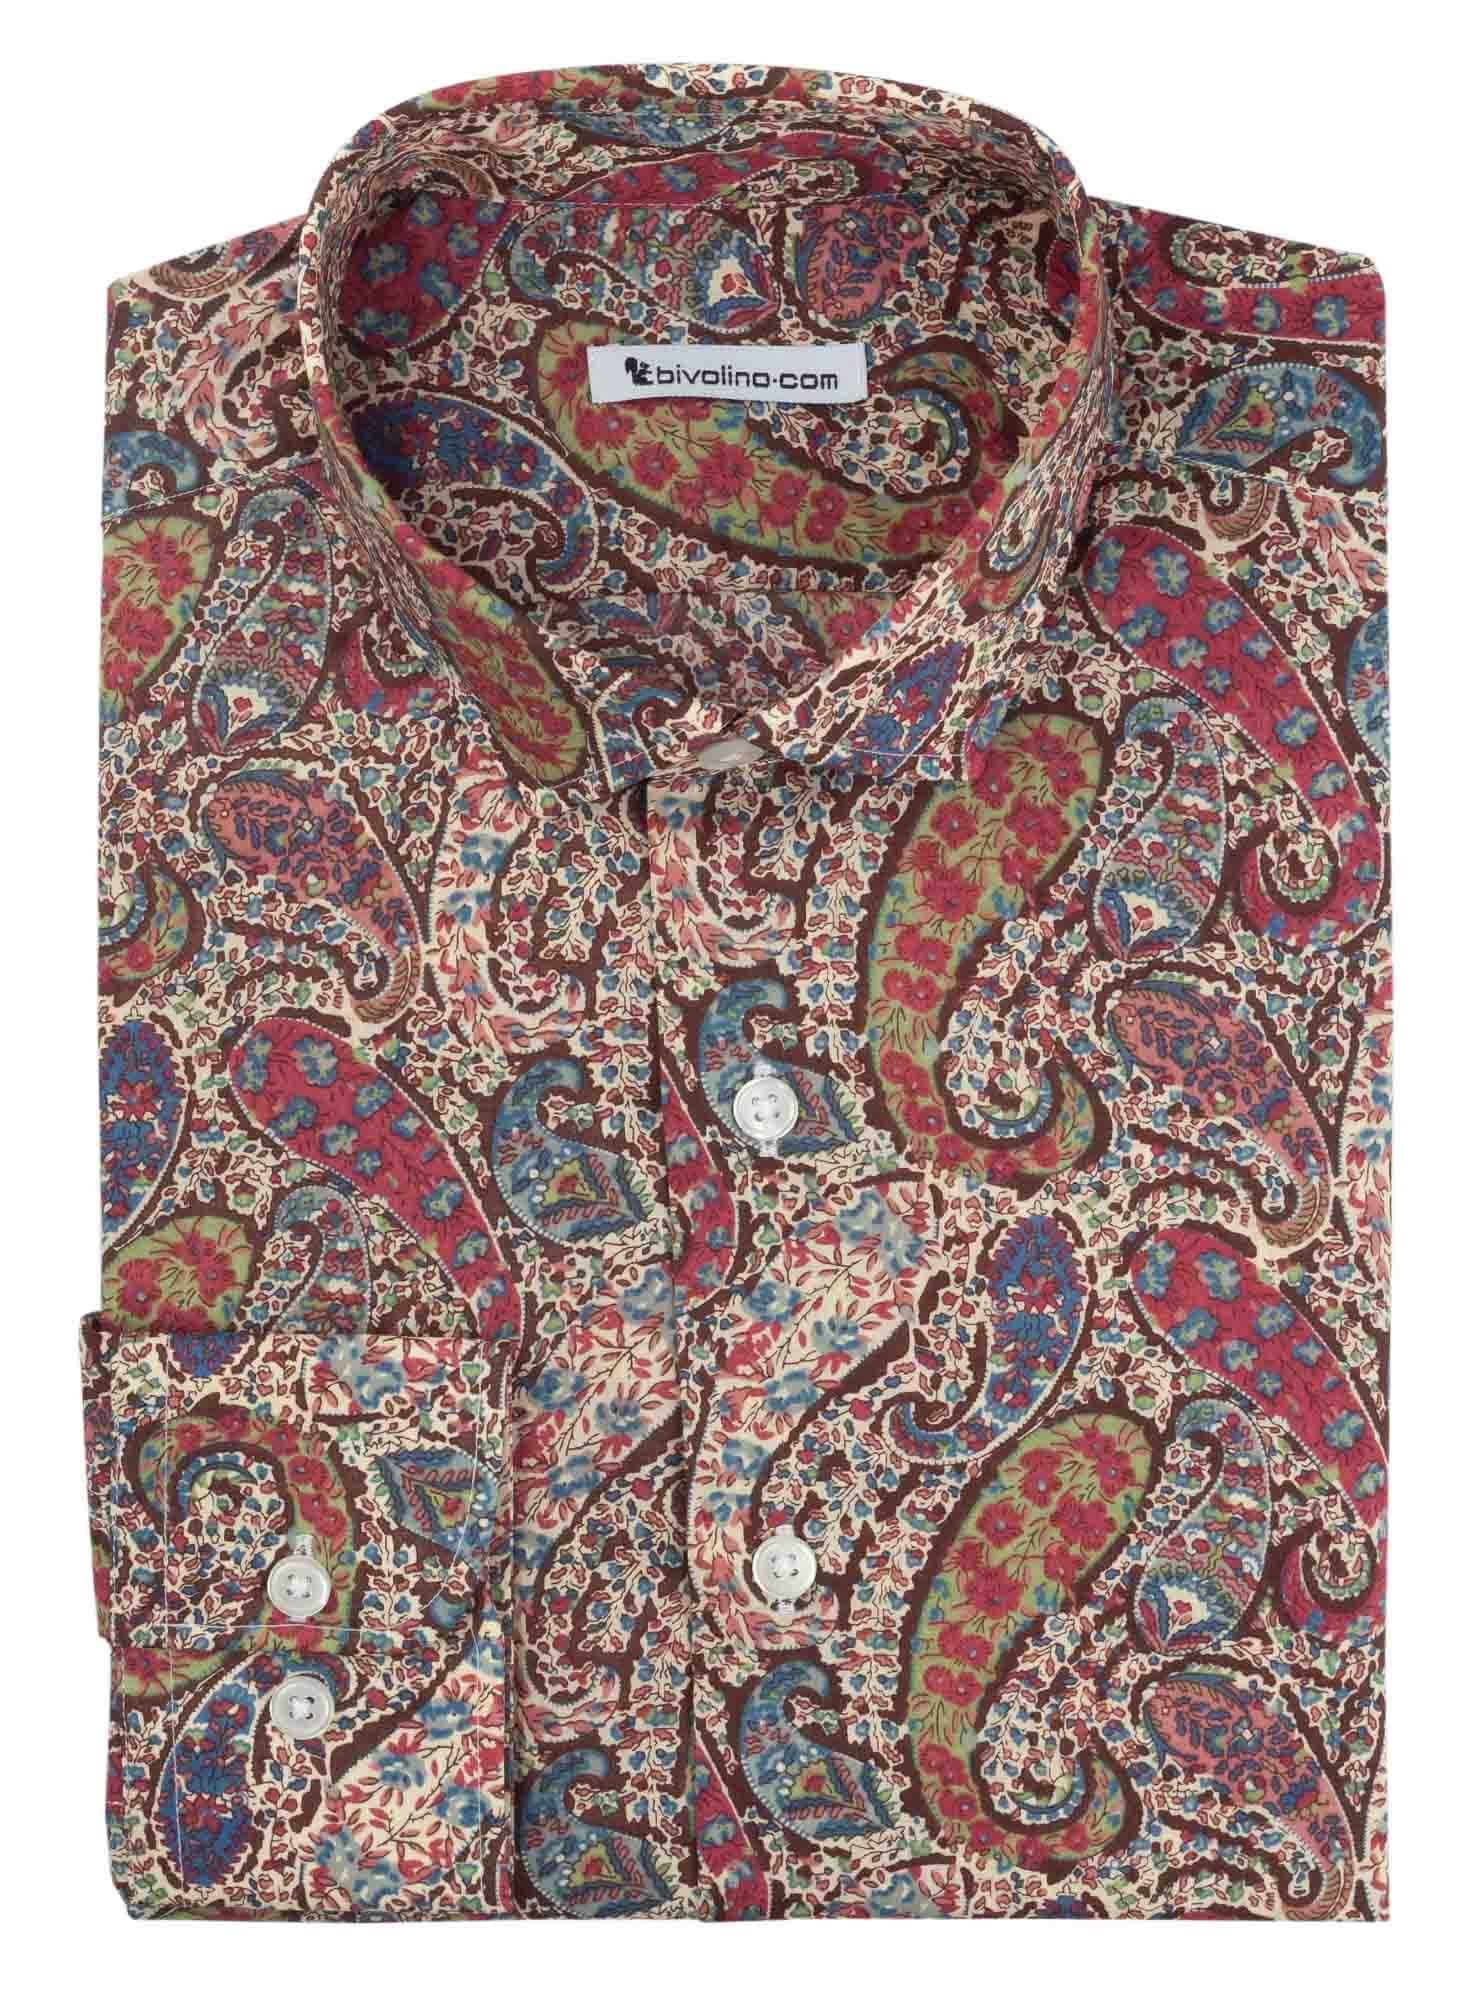 ALBERTIONI -  Liberty of London Flower Men's Shirt  - Liberty 2